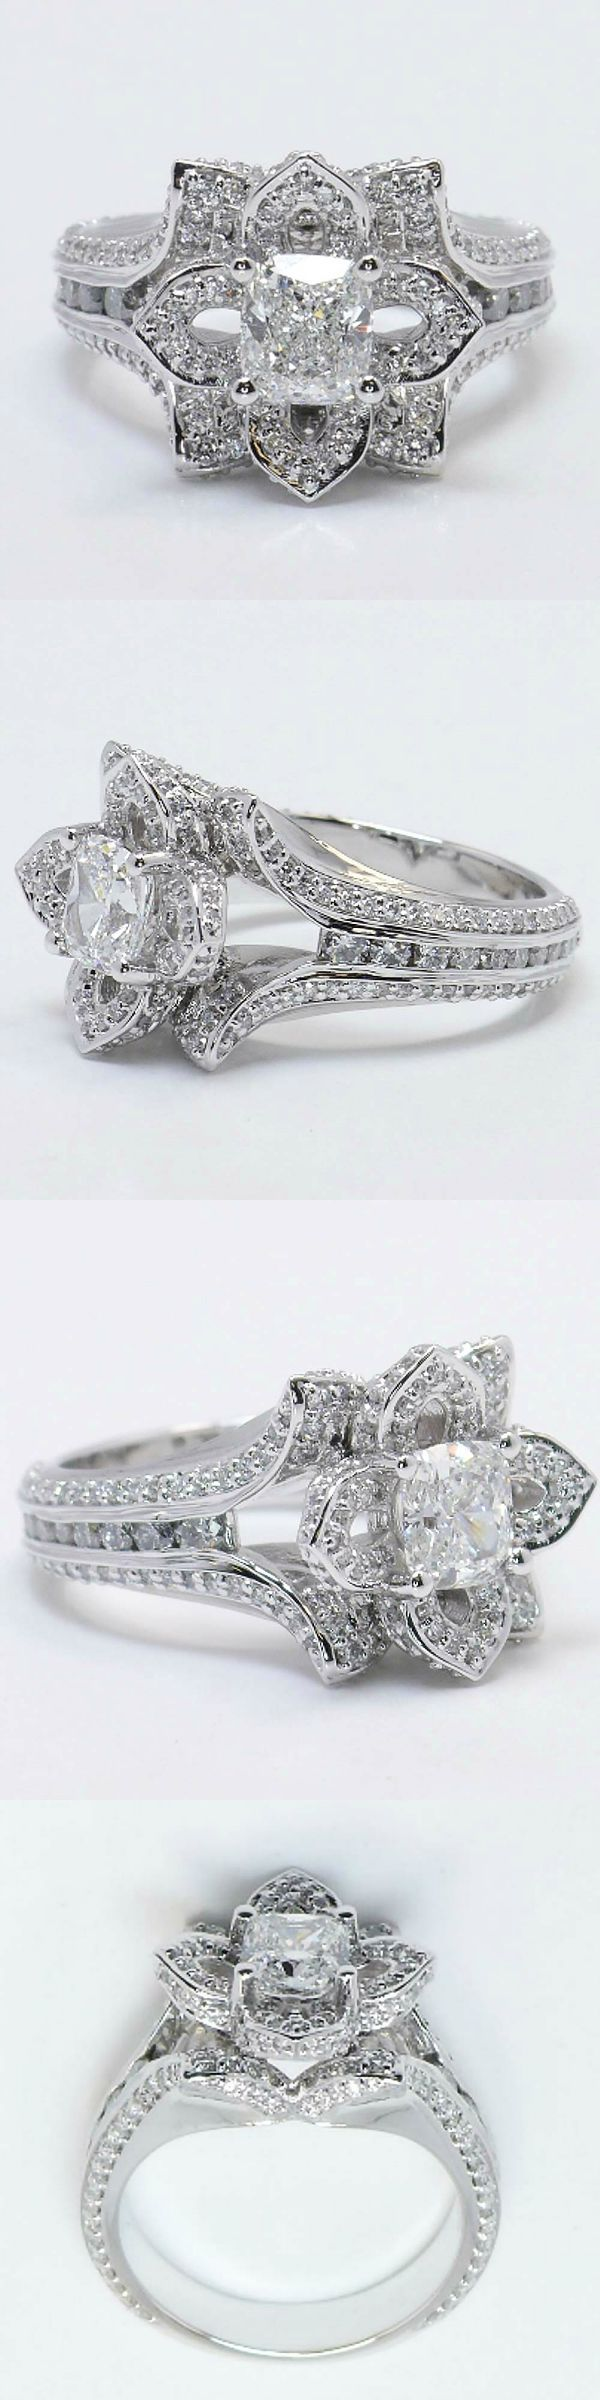 Cushion cut flower inspired diamond ring cushion 1 02 ctw color g clarity